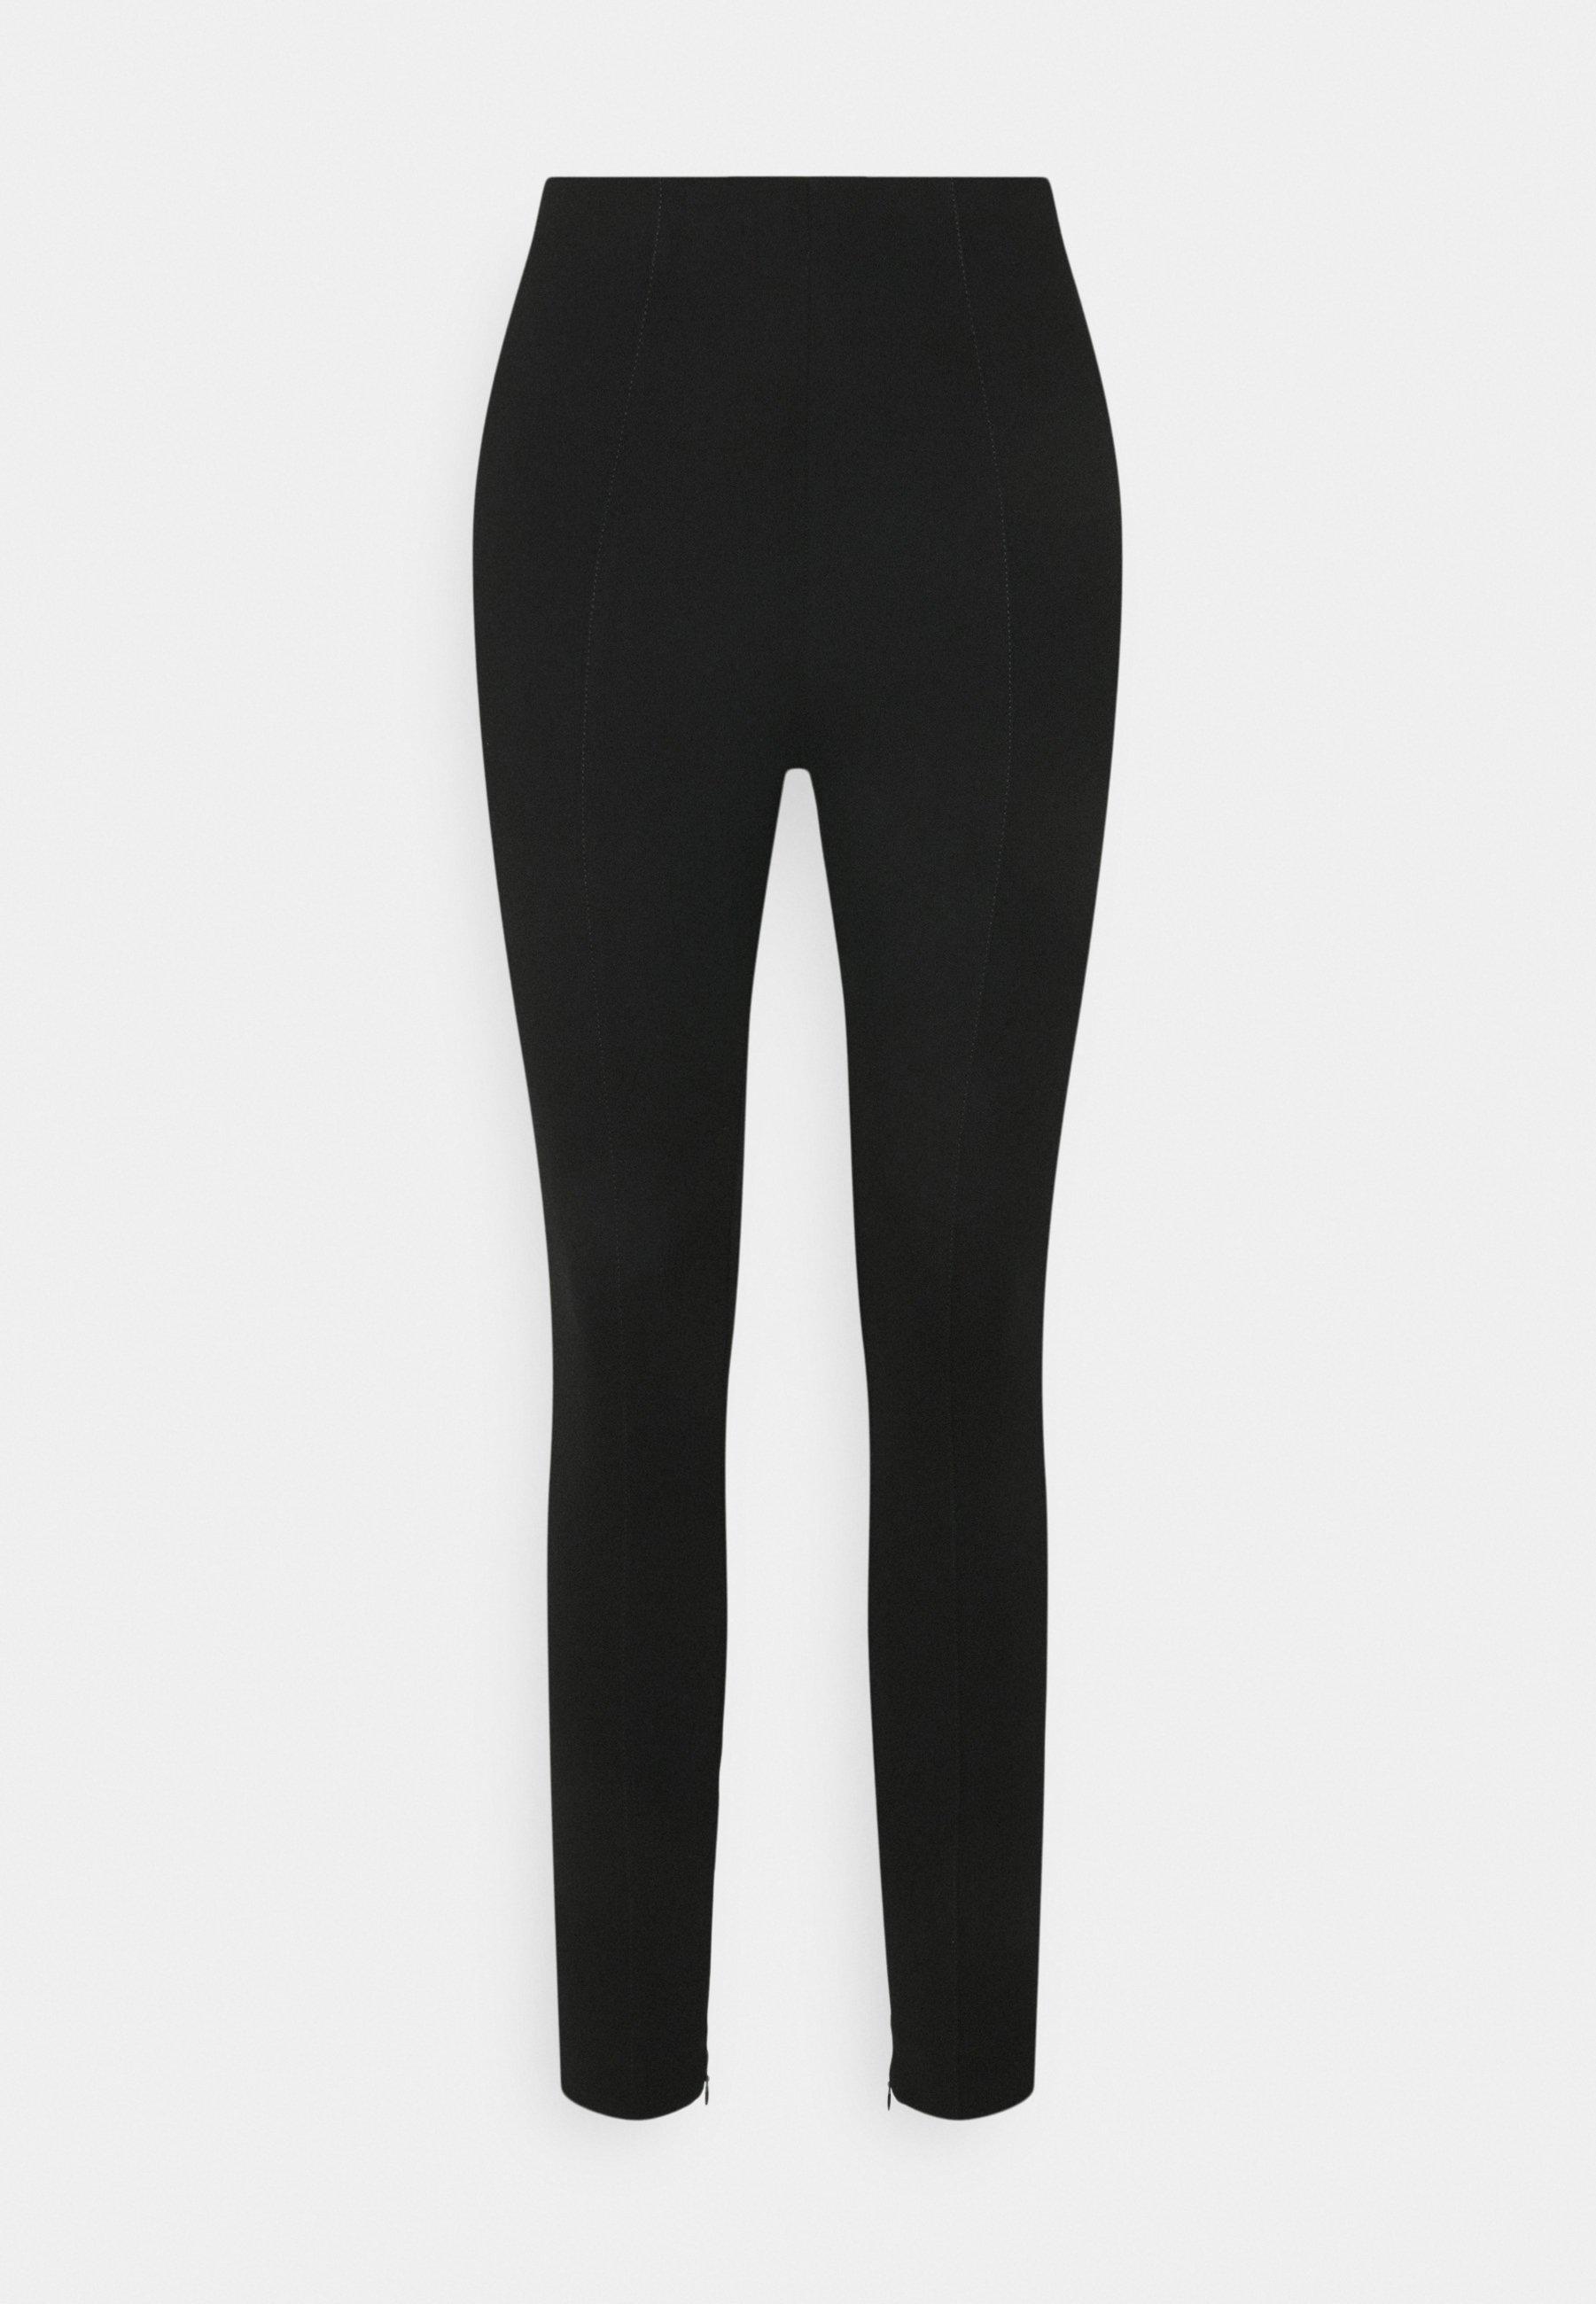 Women ISSA PUNTO - Leggings - Trousers